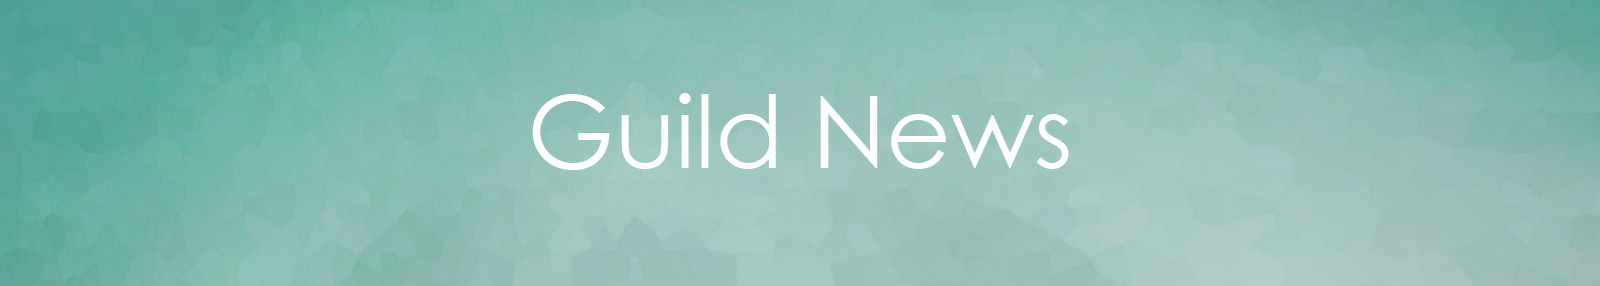 header_image_news